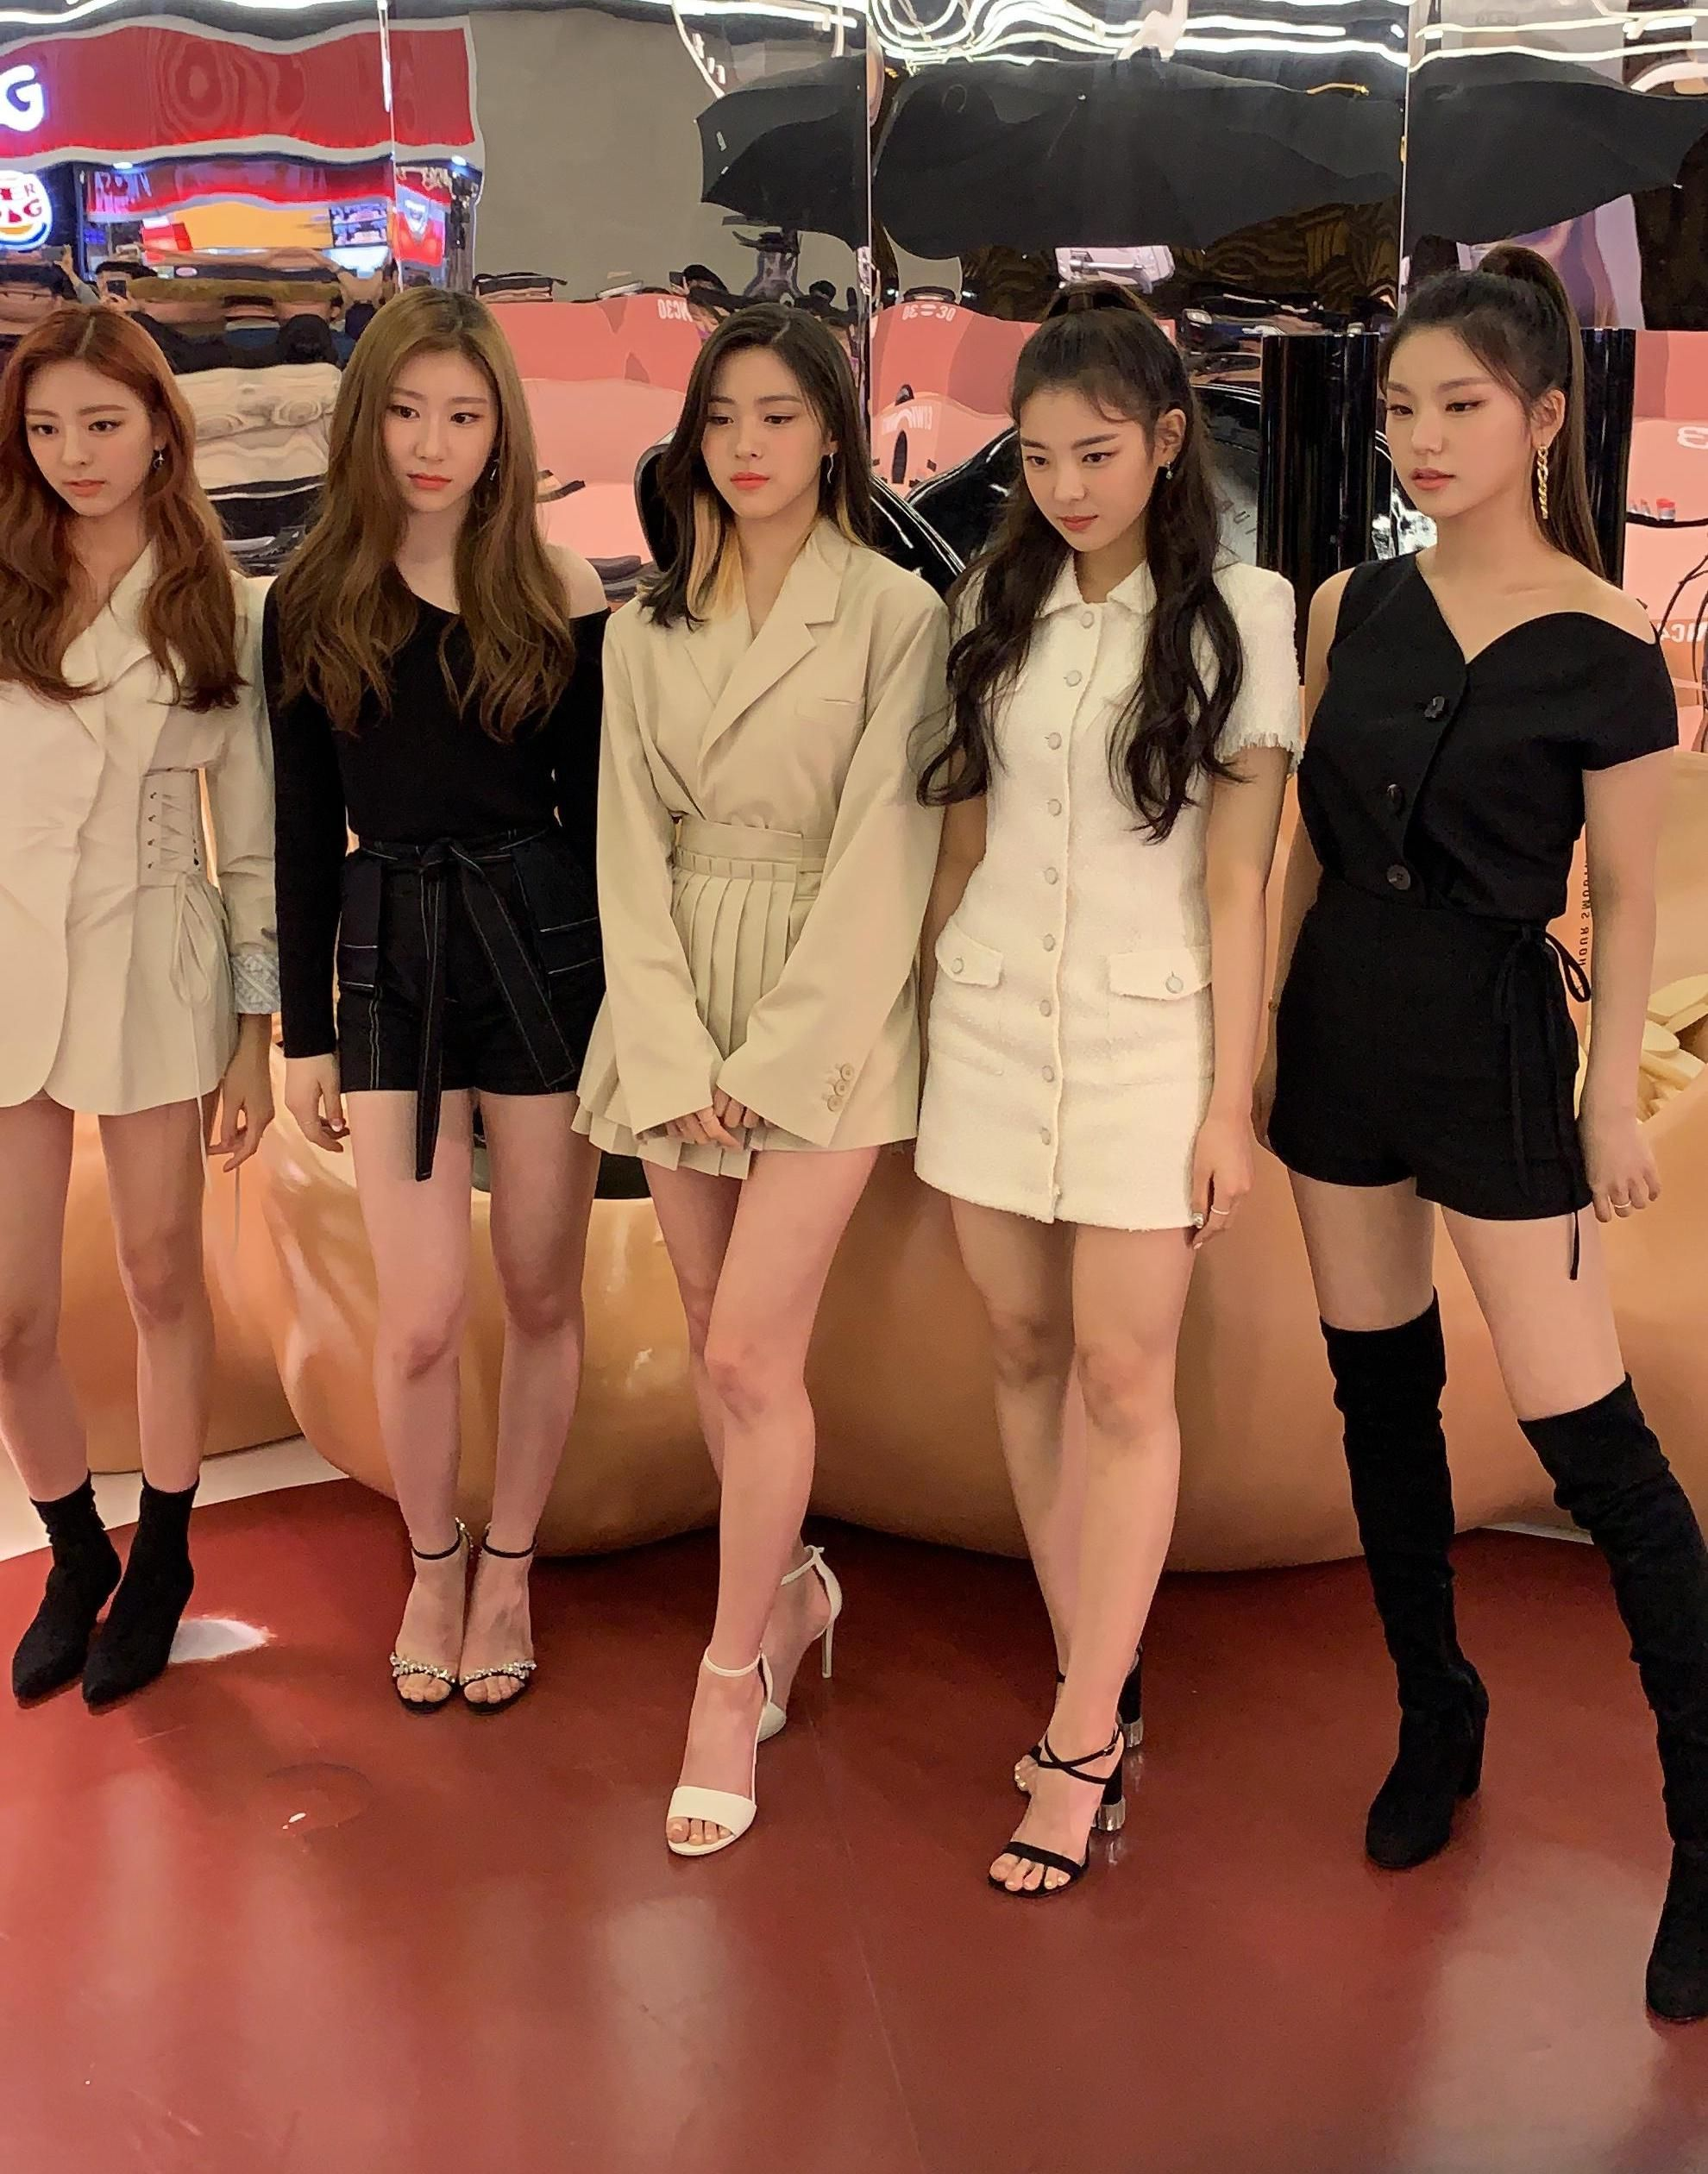 Itzy Chaeryoung Ryujin And Lia Feet R Kpopfeets Kpopfeets Kpop Itzy Kpop Fashion Outfits Kpop Outfits